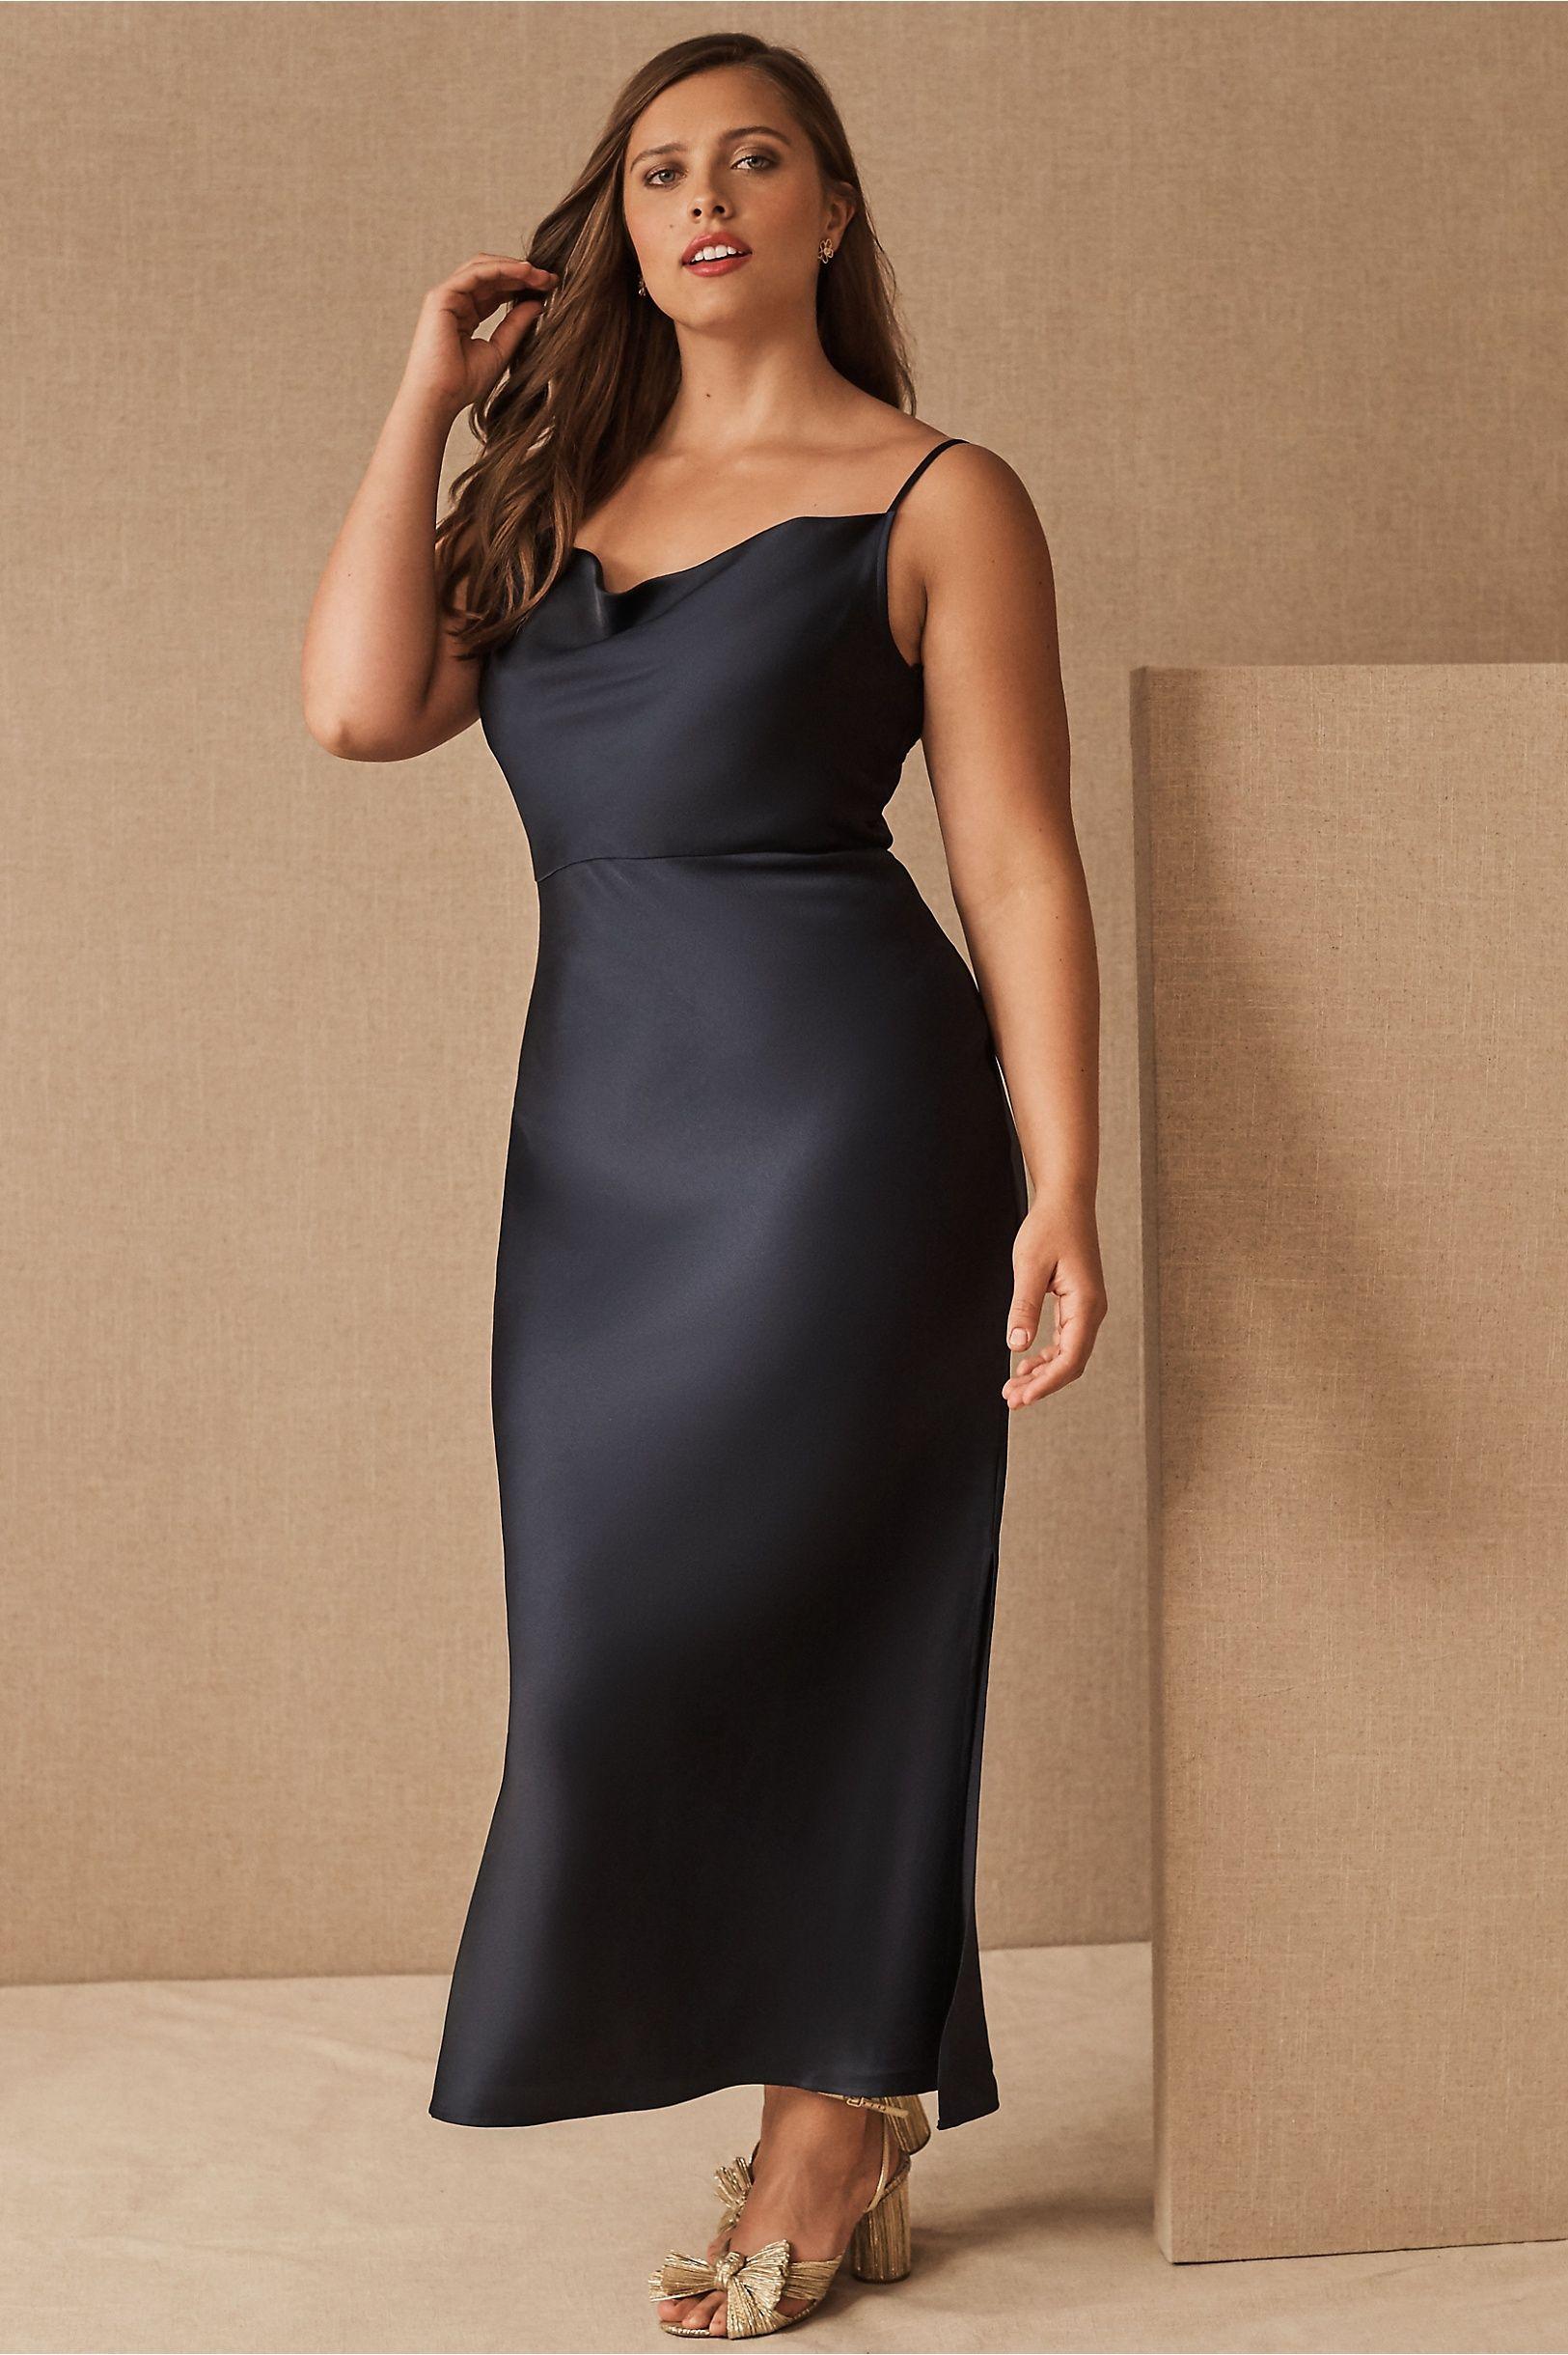 Cali Satin Charmeuse Midi Dress In 2021 Black Satin Bridesmaid Dress Black Bridesmaid Dresses Backless Bridesmaid Dress [ 2440 x 1625 Pixel ]